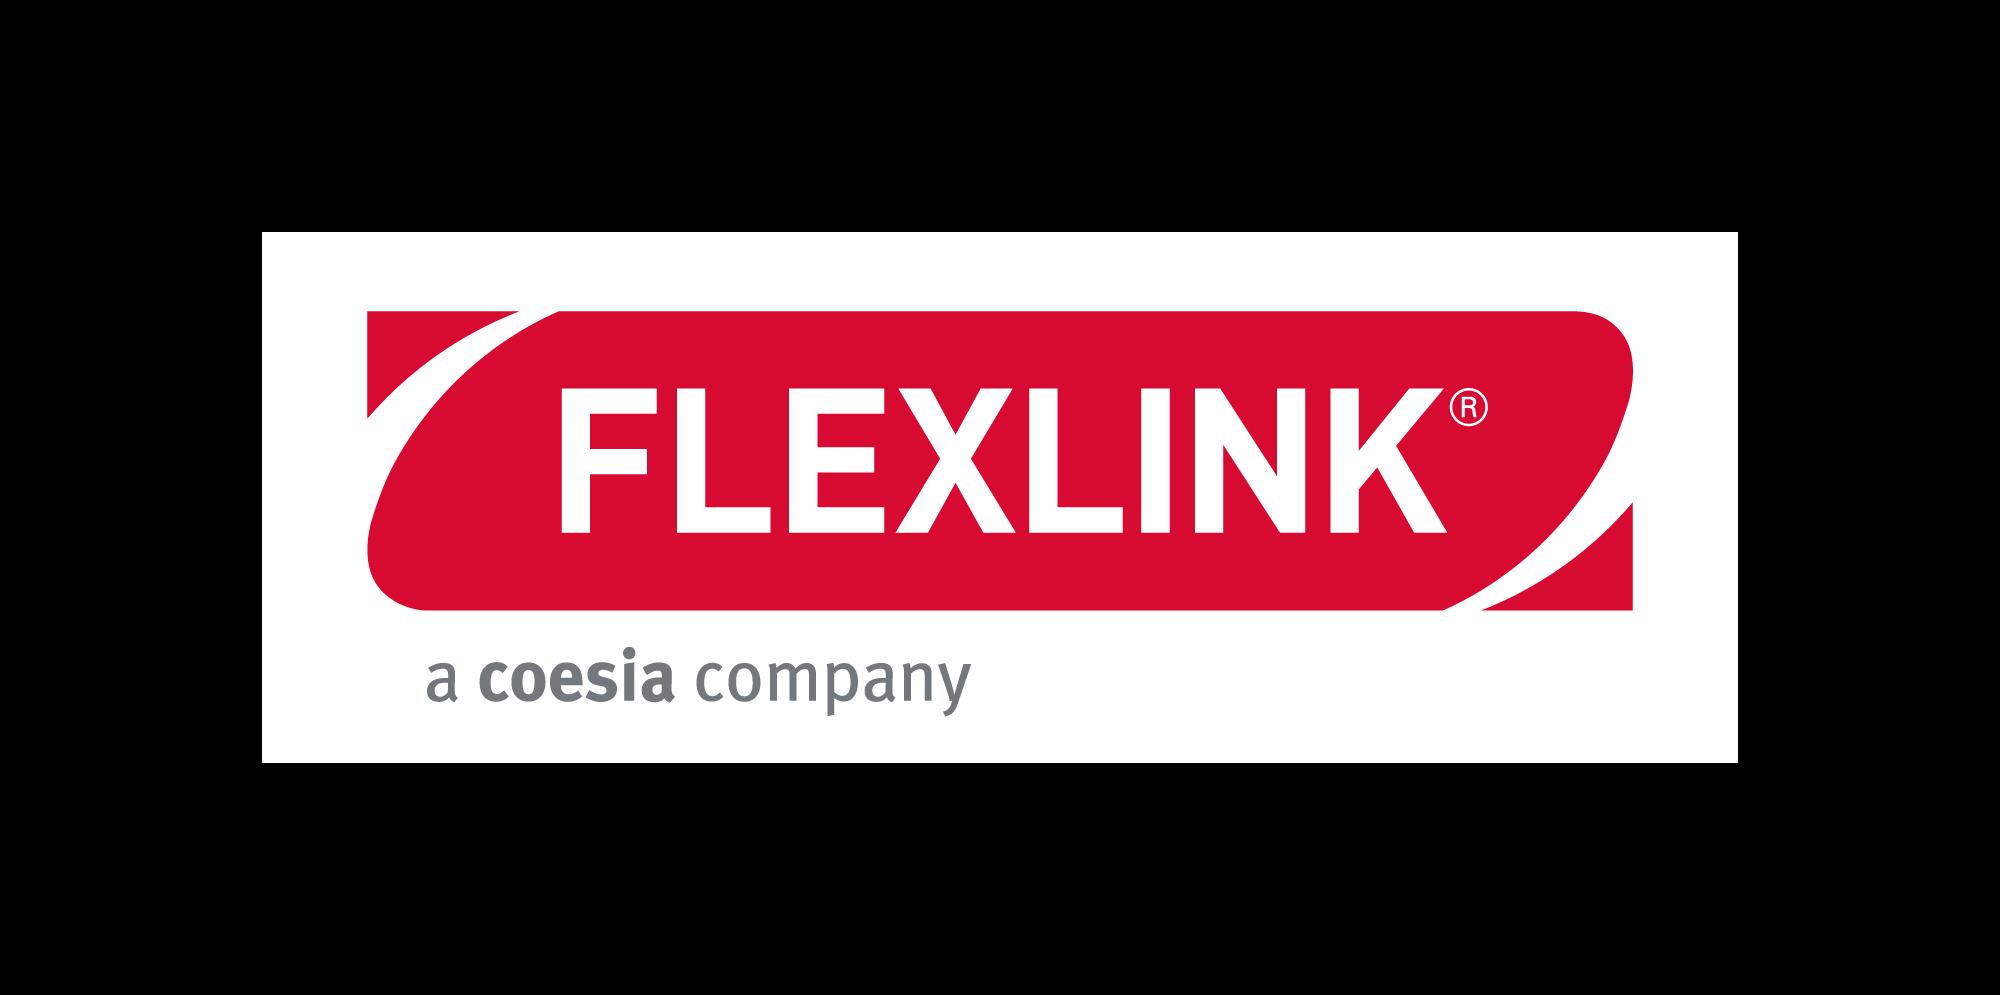 FLEXLINK